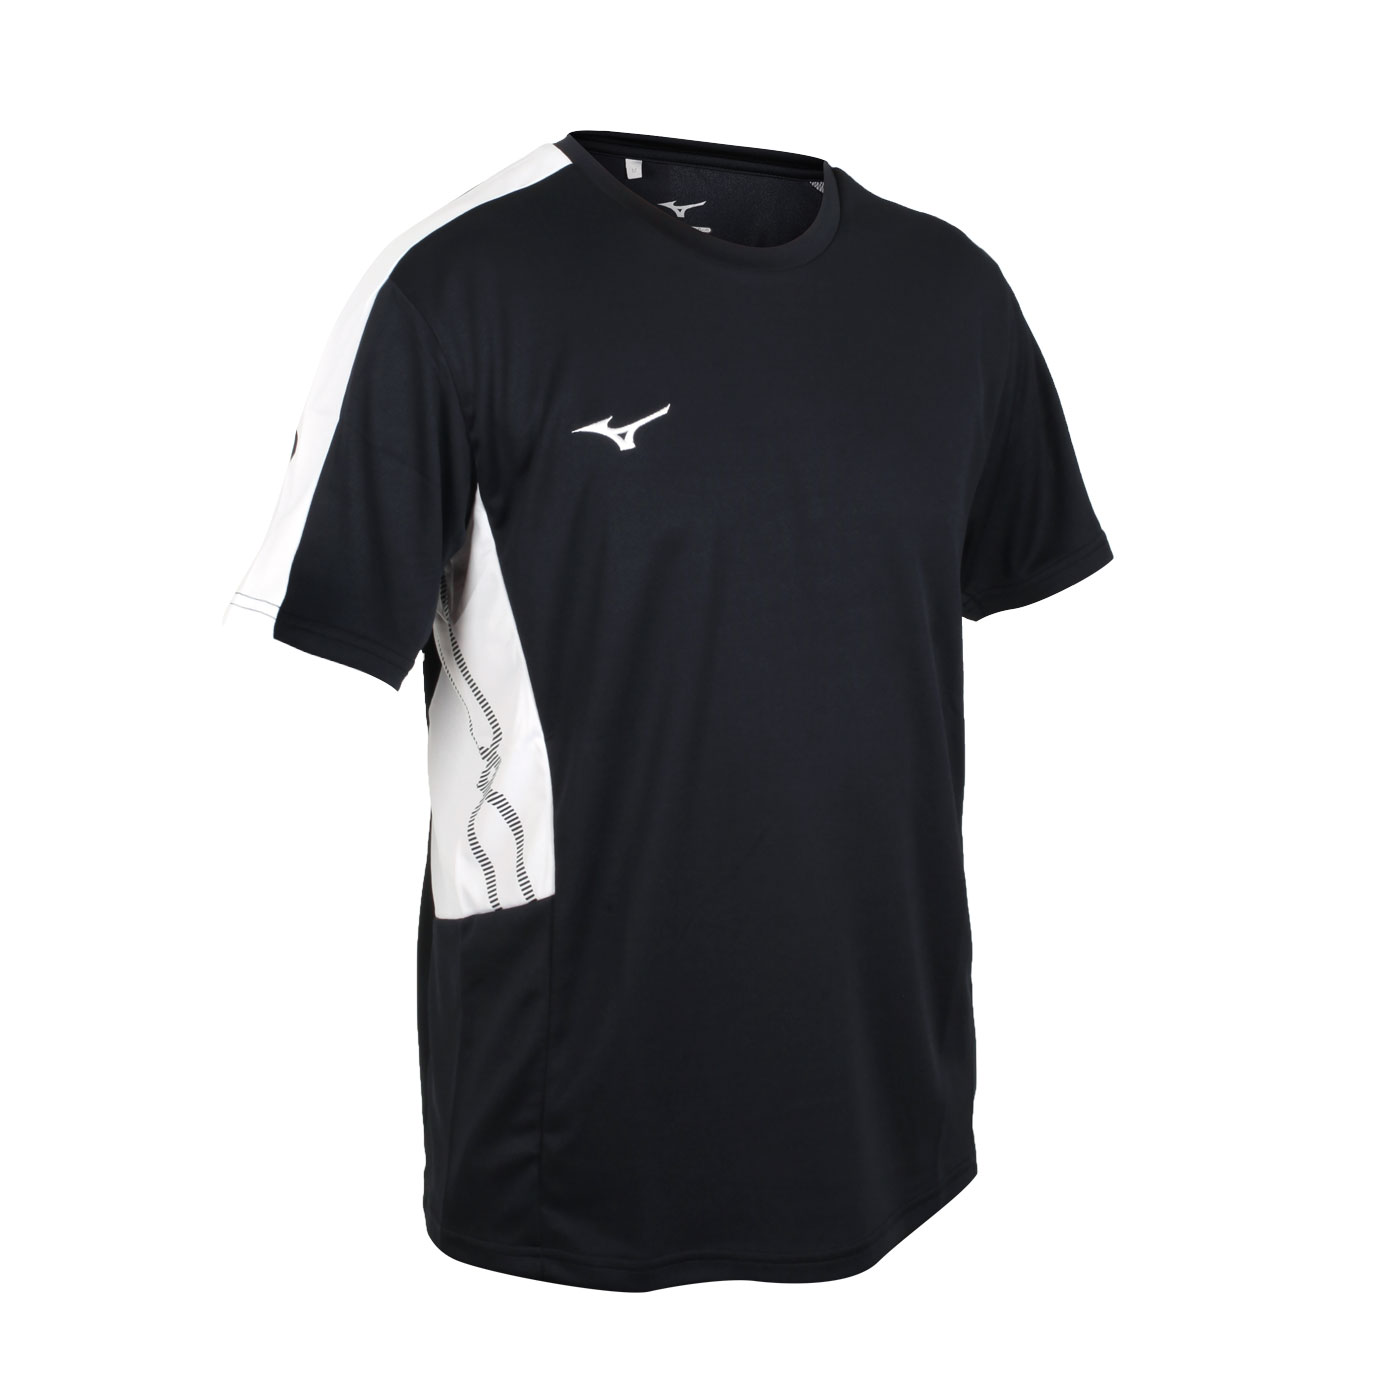 MIZUNO 男款短袖T恤 32TA101009 - 黑白